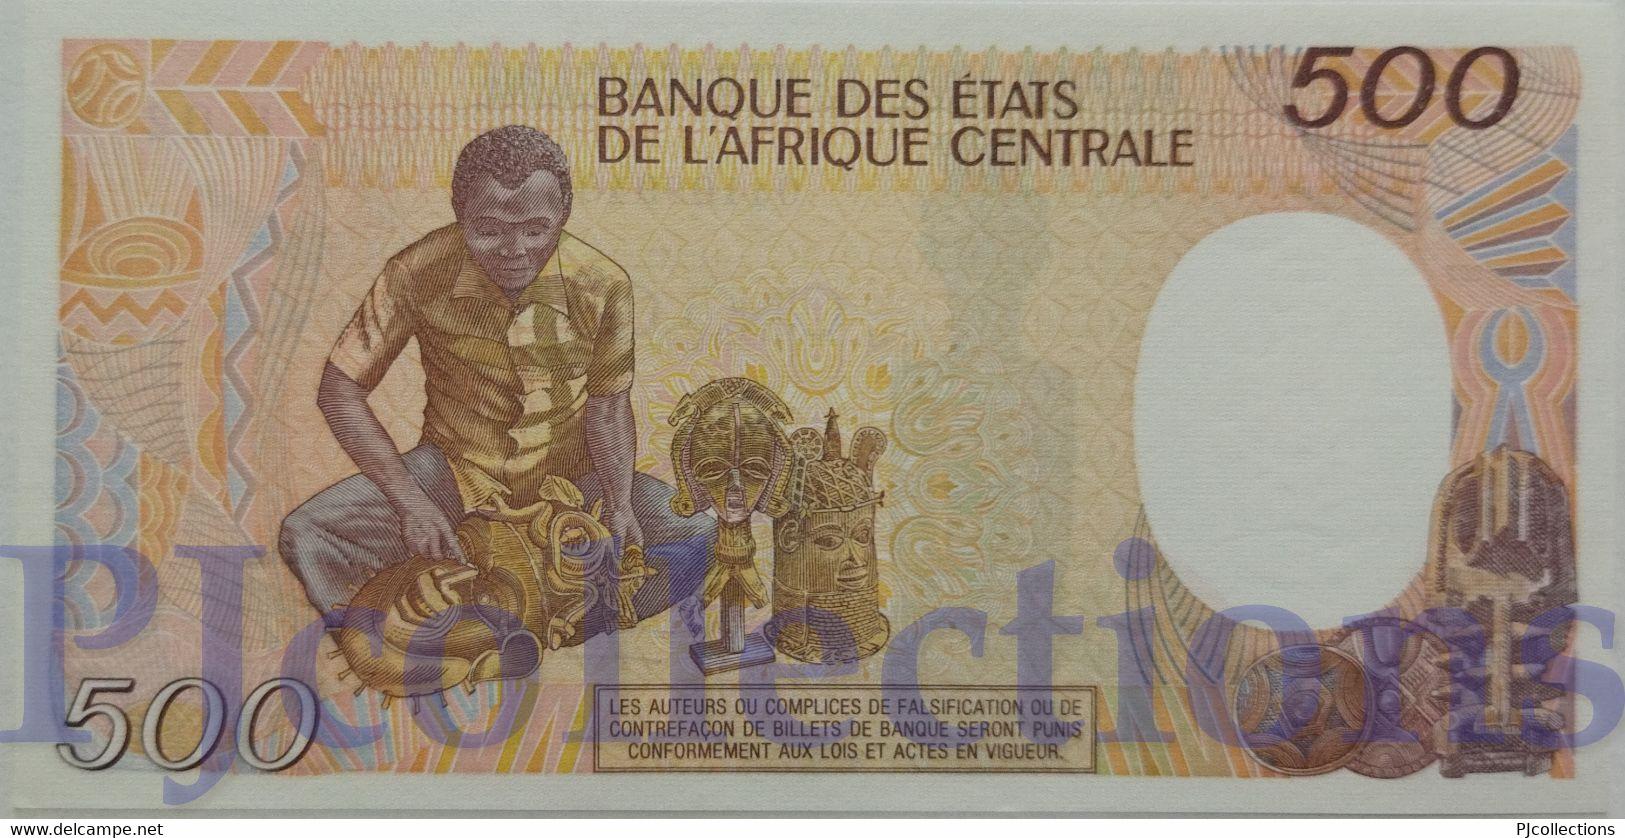 EQUATORIAL GUINEA 500 FRANCS 1985 PICK 20 UNC - Guinée Equatoriale